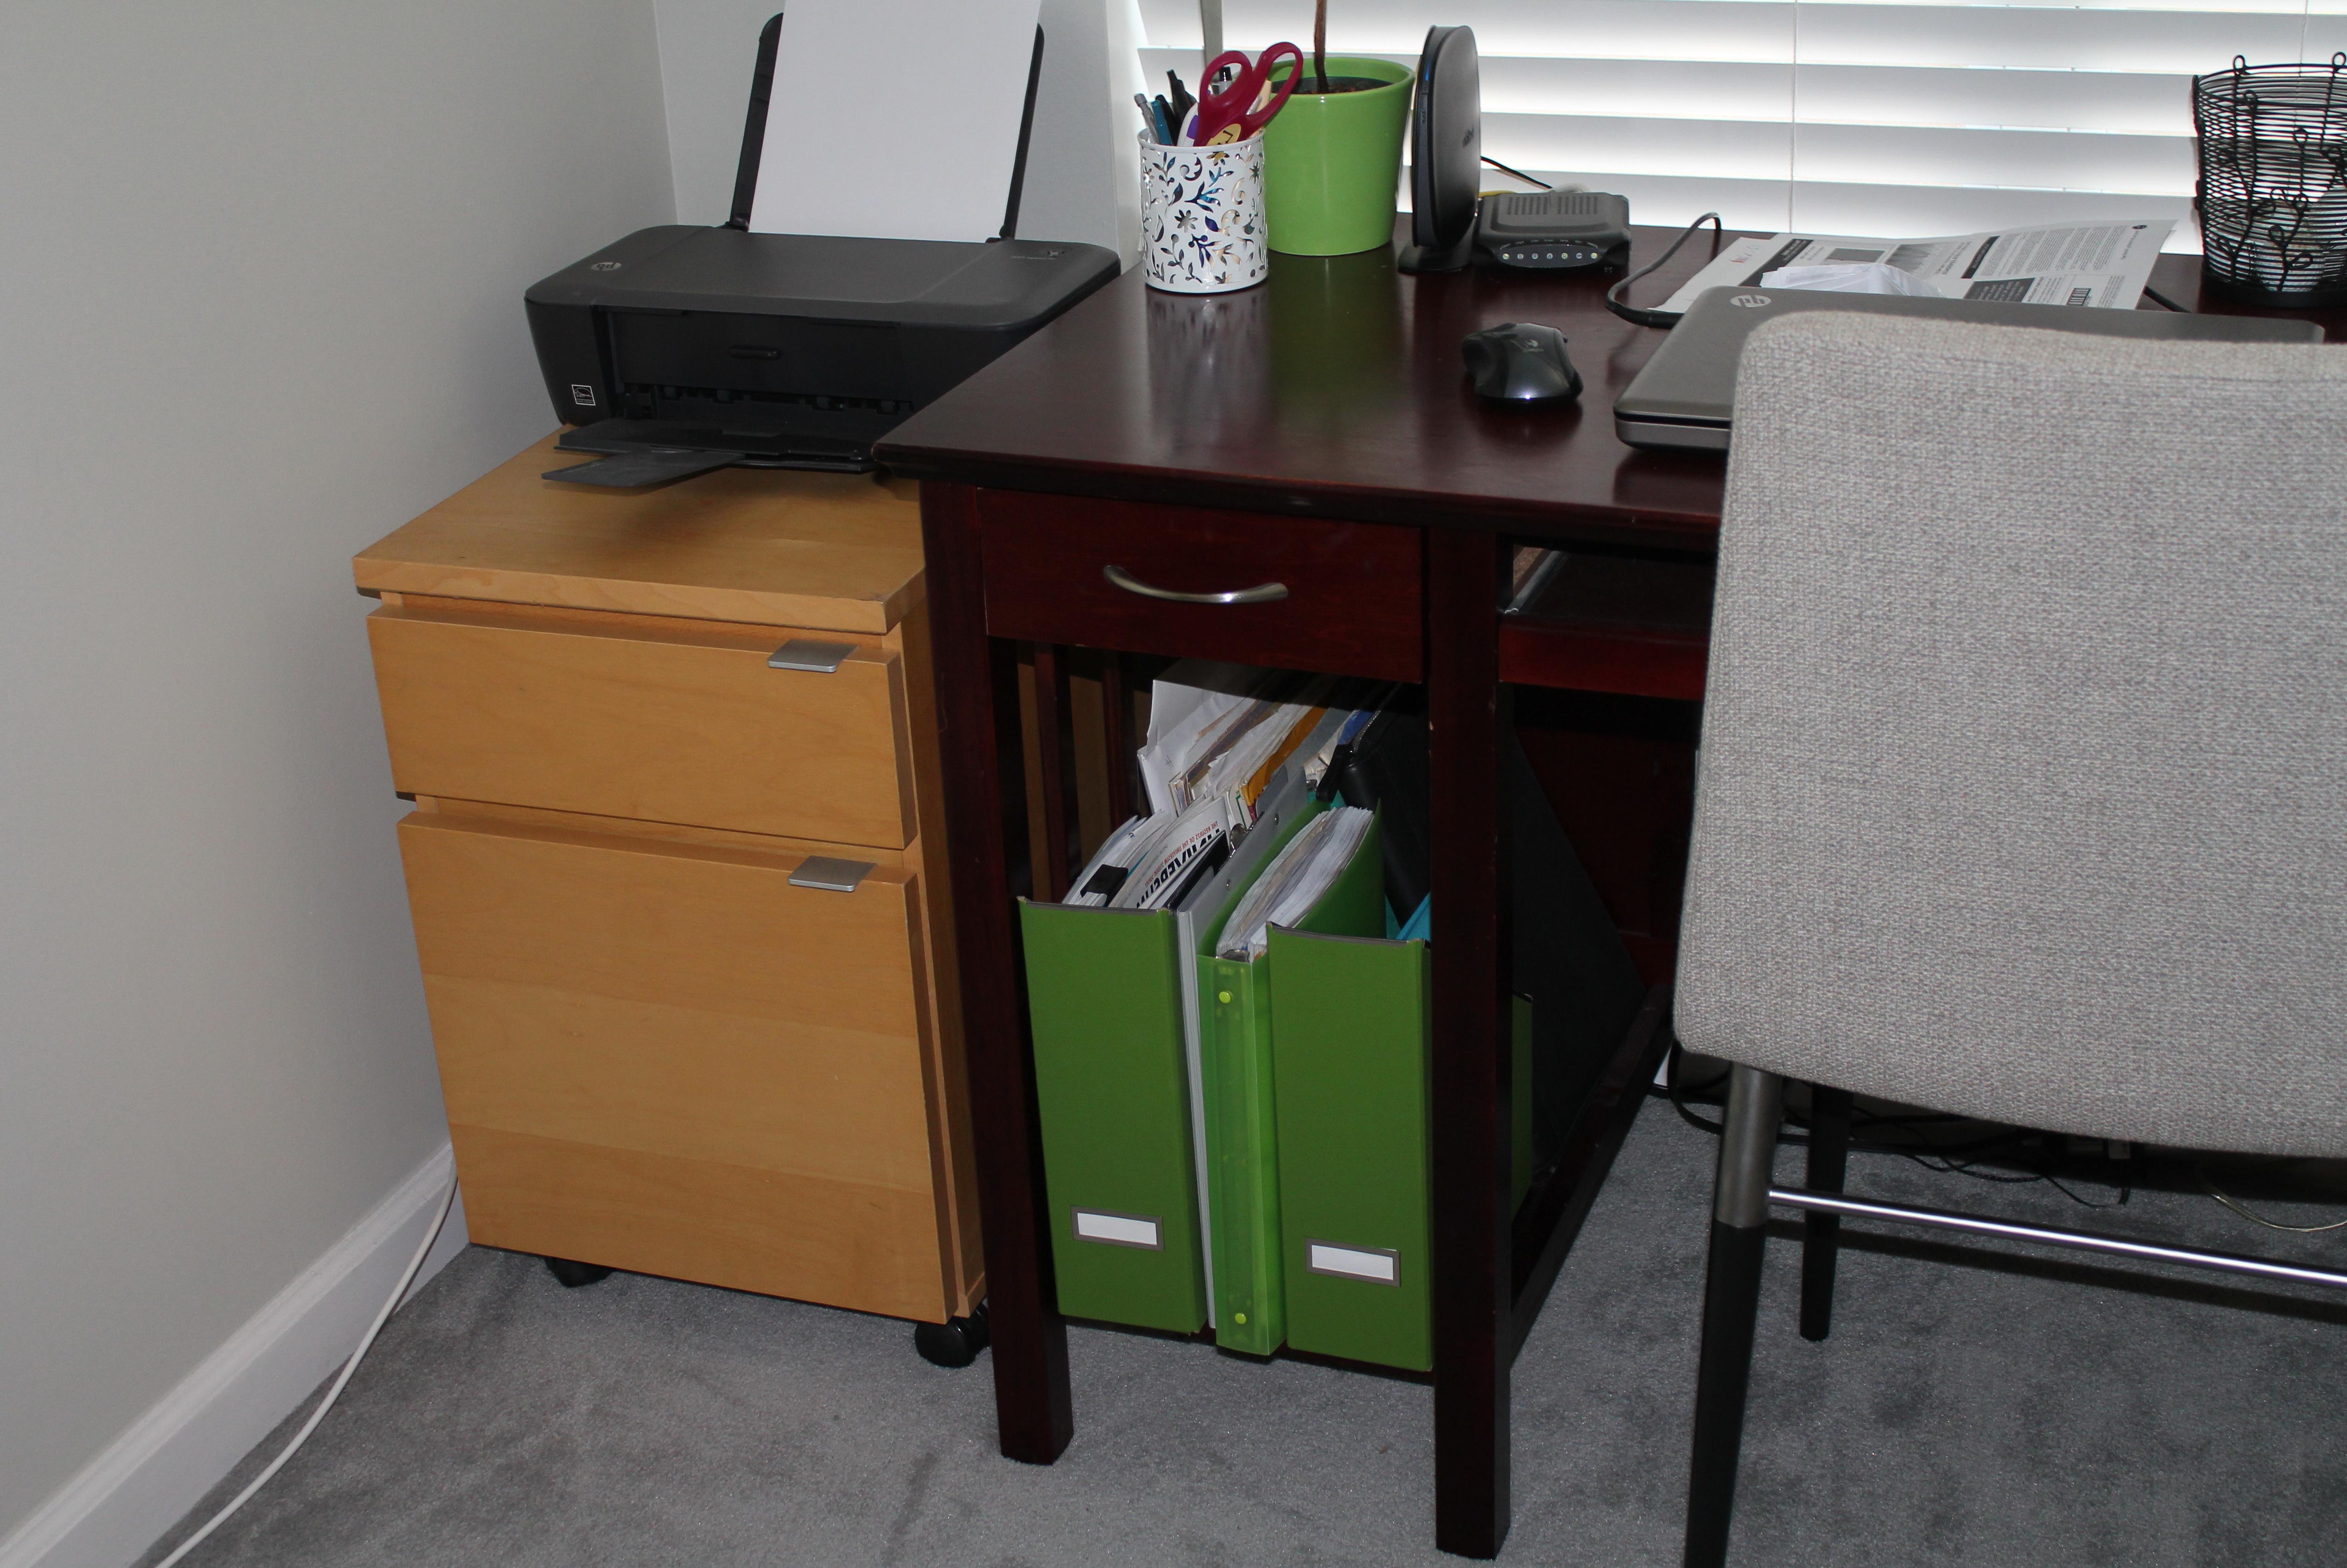 Ikea Filing Cabinet Hack